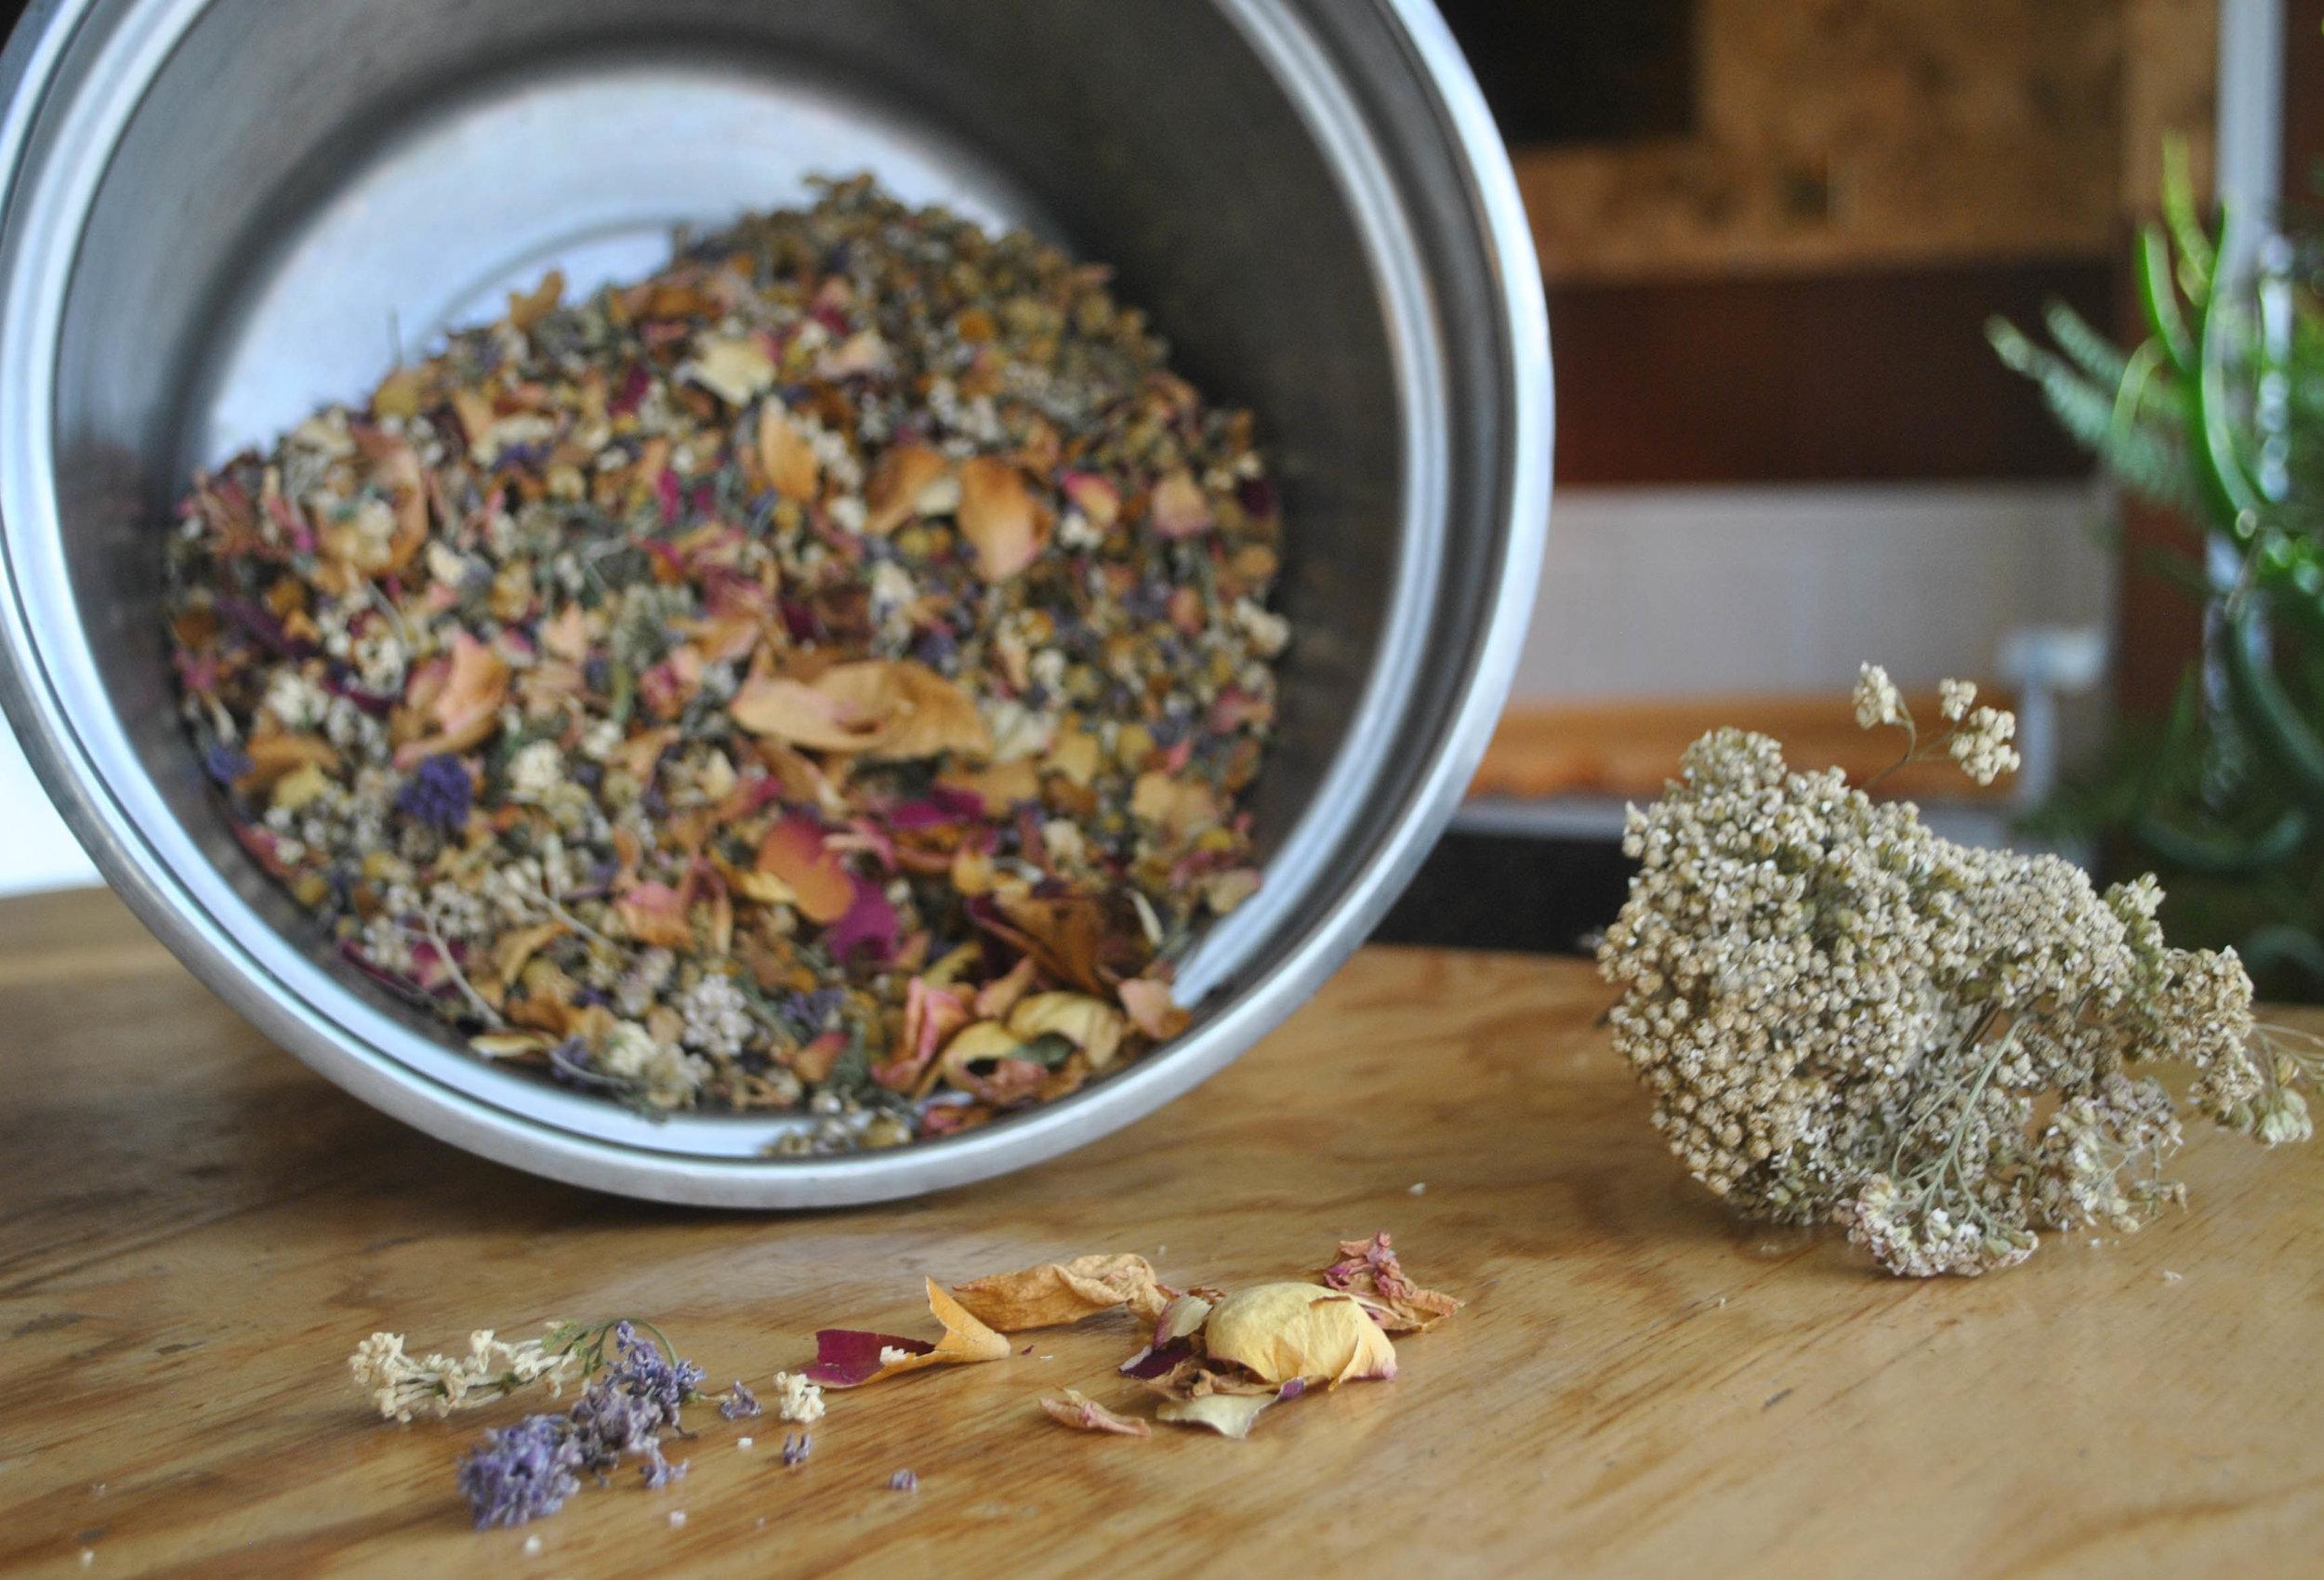 The Floral Tea:  Chamomile, Yarrow, Rose Petal, Echinacea, and Dandelion